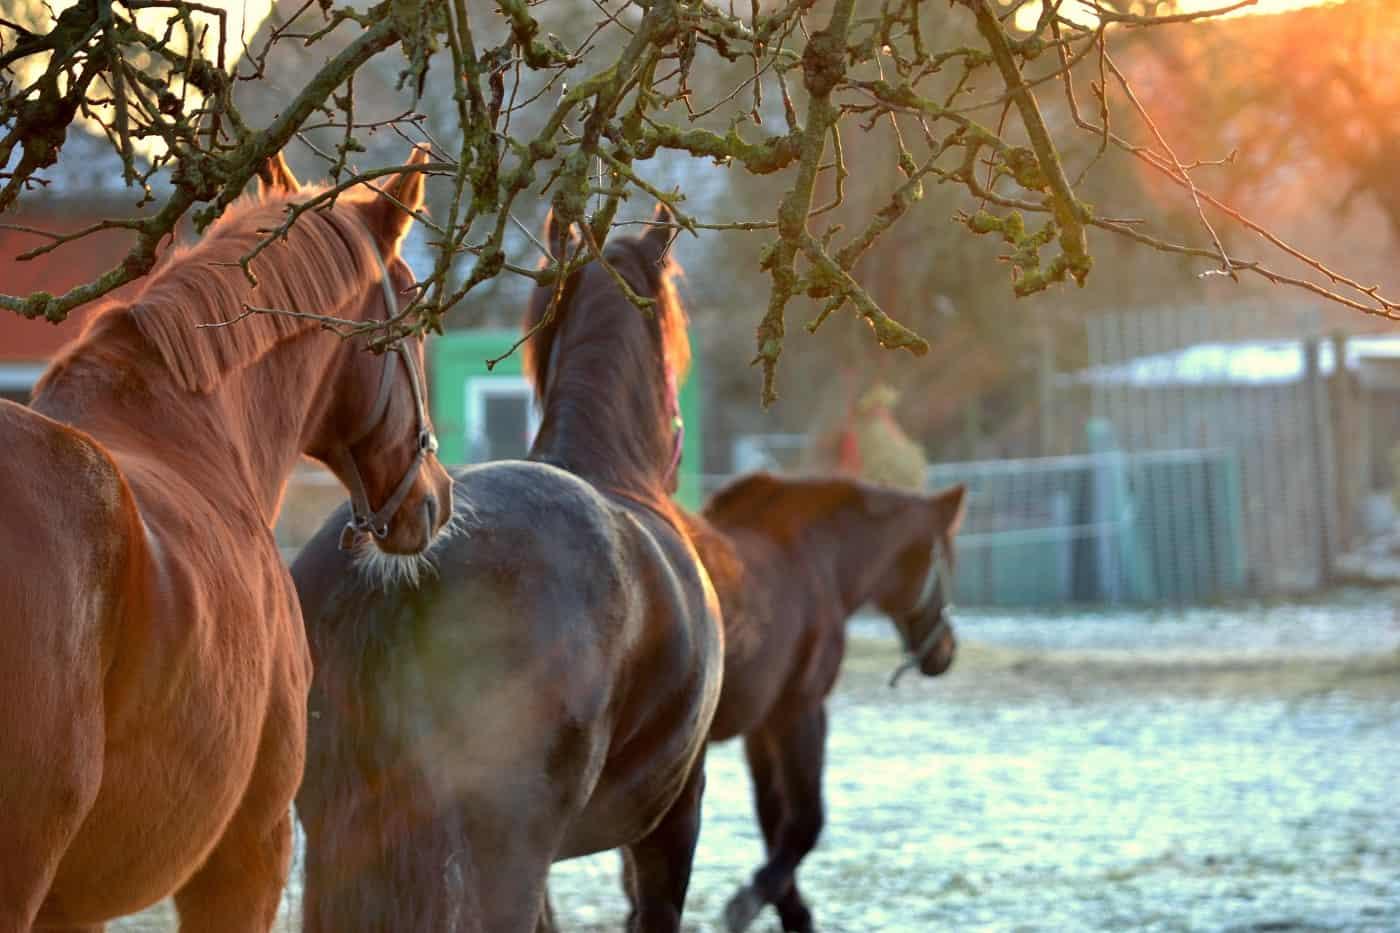 Three brown horses walking in field - Addiction treatment